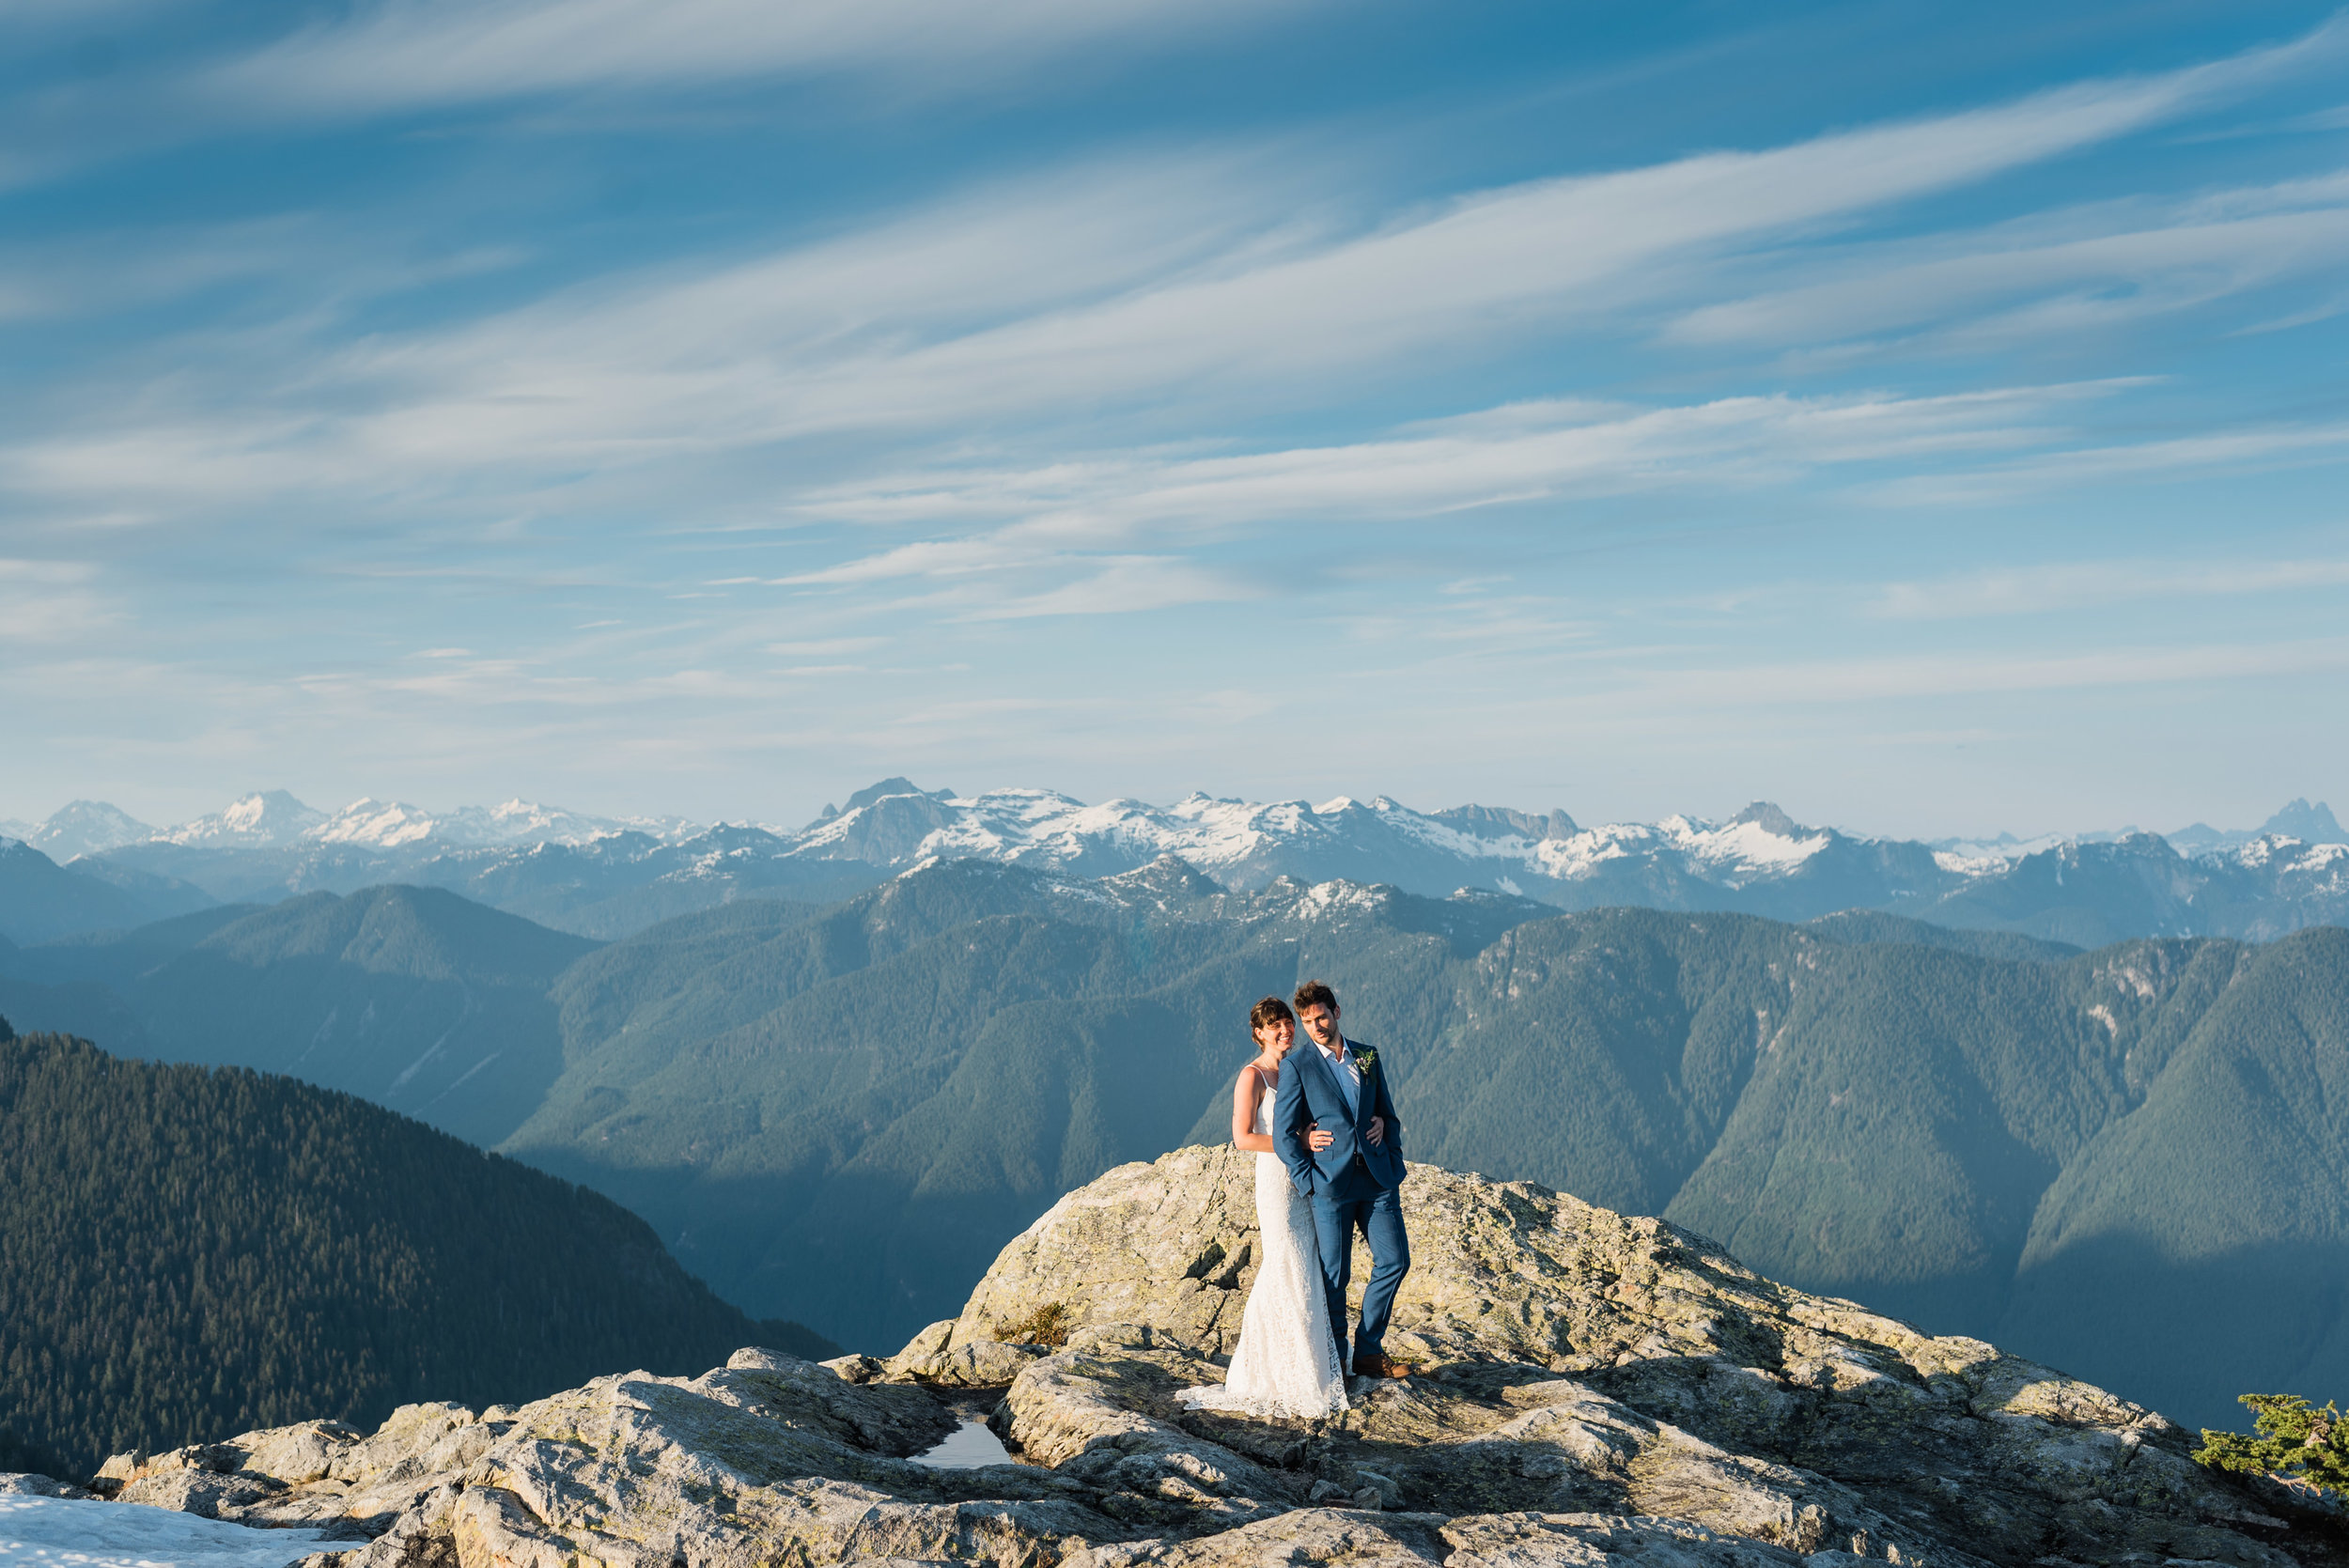 Mt-Seymour-styled-shoot-0036-jelger-tanja-photographers.jpg